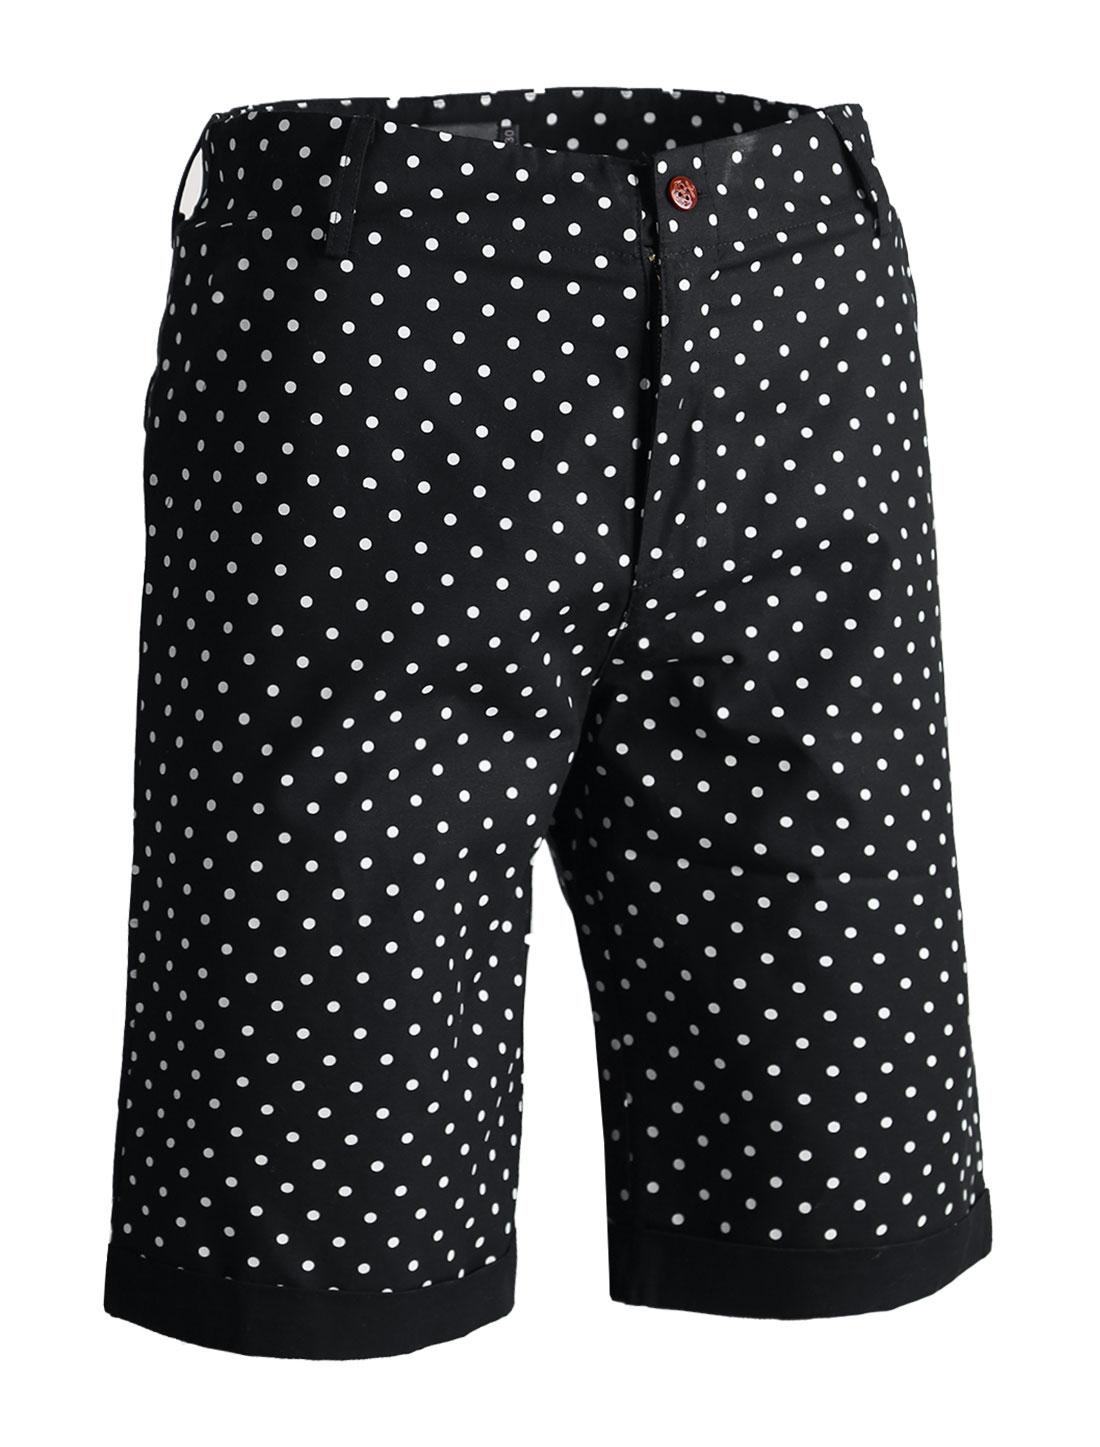 Men Polka Dot Print Buttoned Flap Pockets Cuffed Chino Shorts Black W28